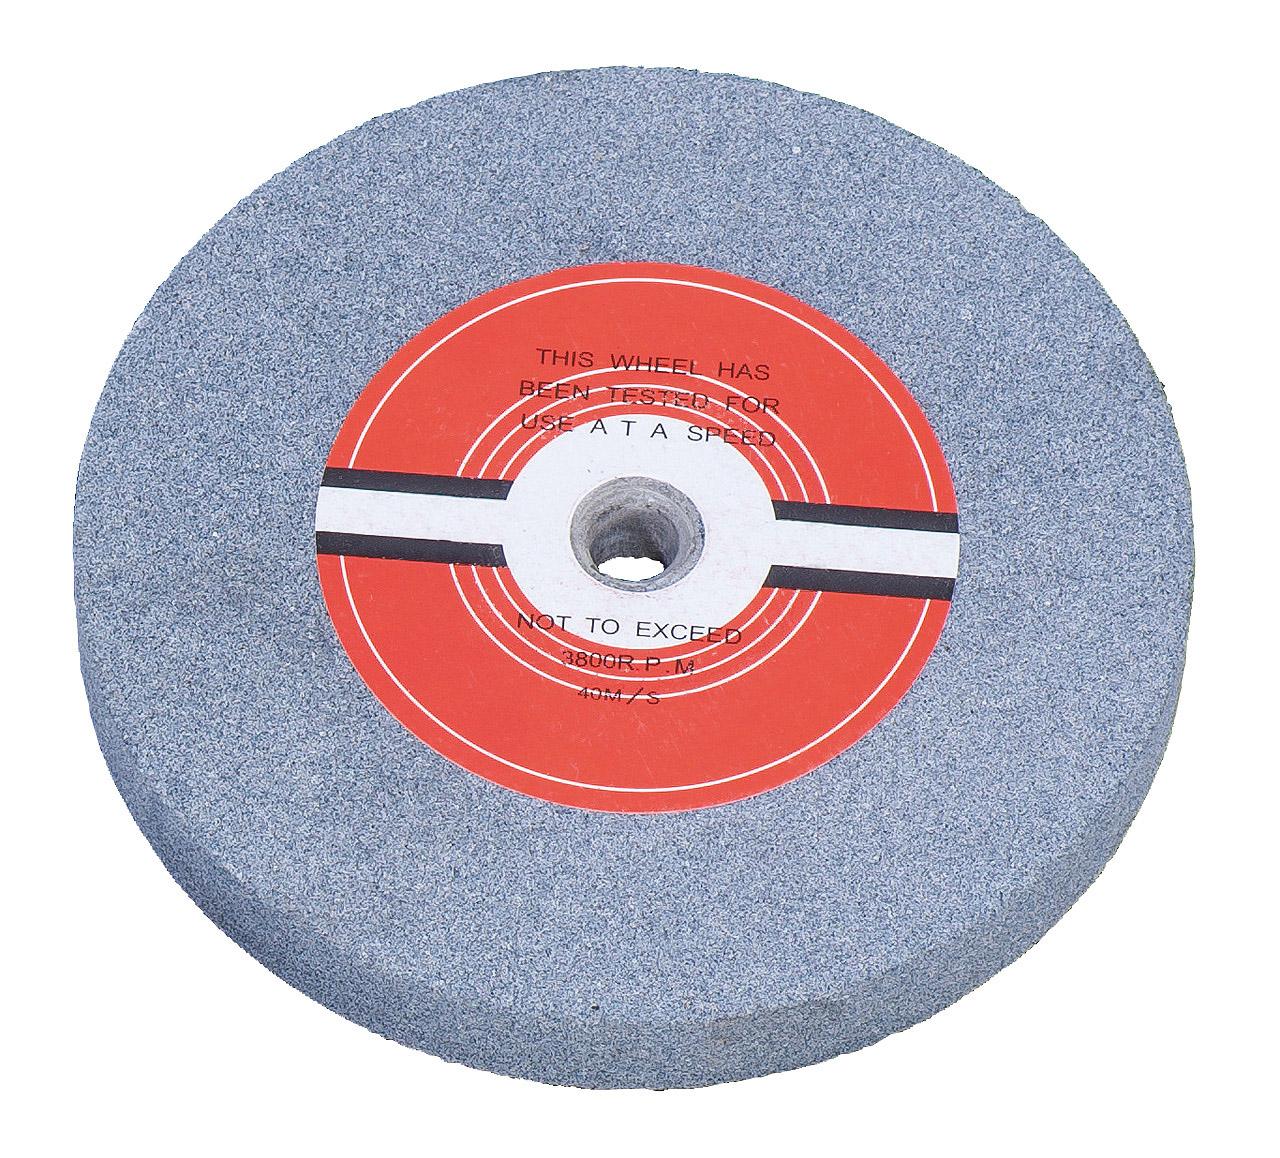 Tarcza szlifierska (tlenek glinu) miękka Ø 200 x 32 mm, Ø 32 mm, G 80 BERNARDO